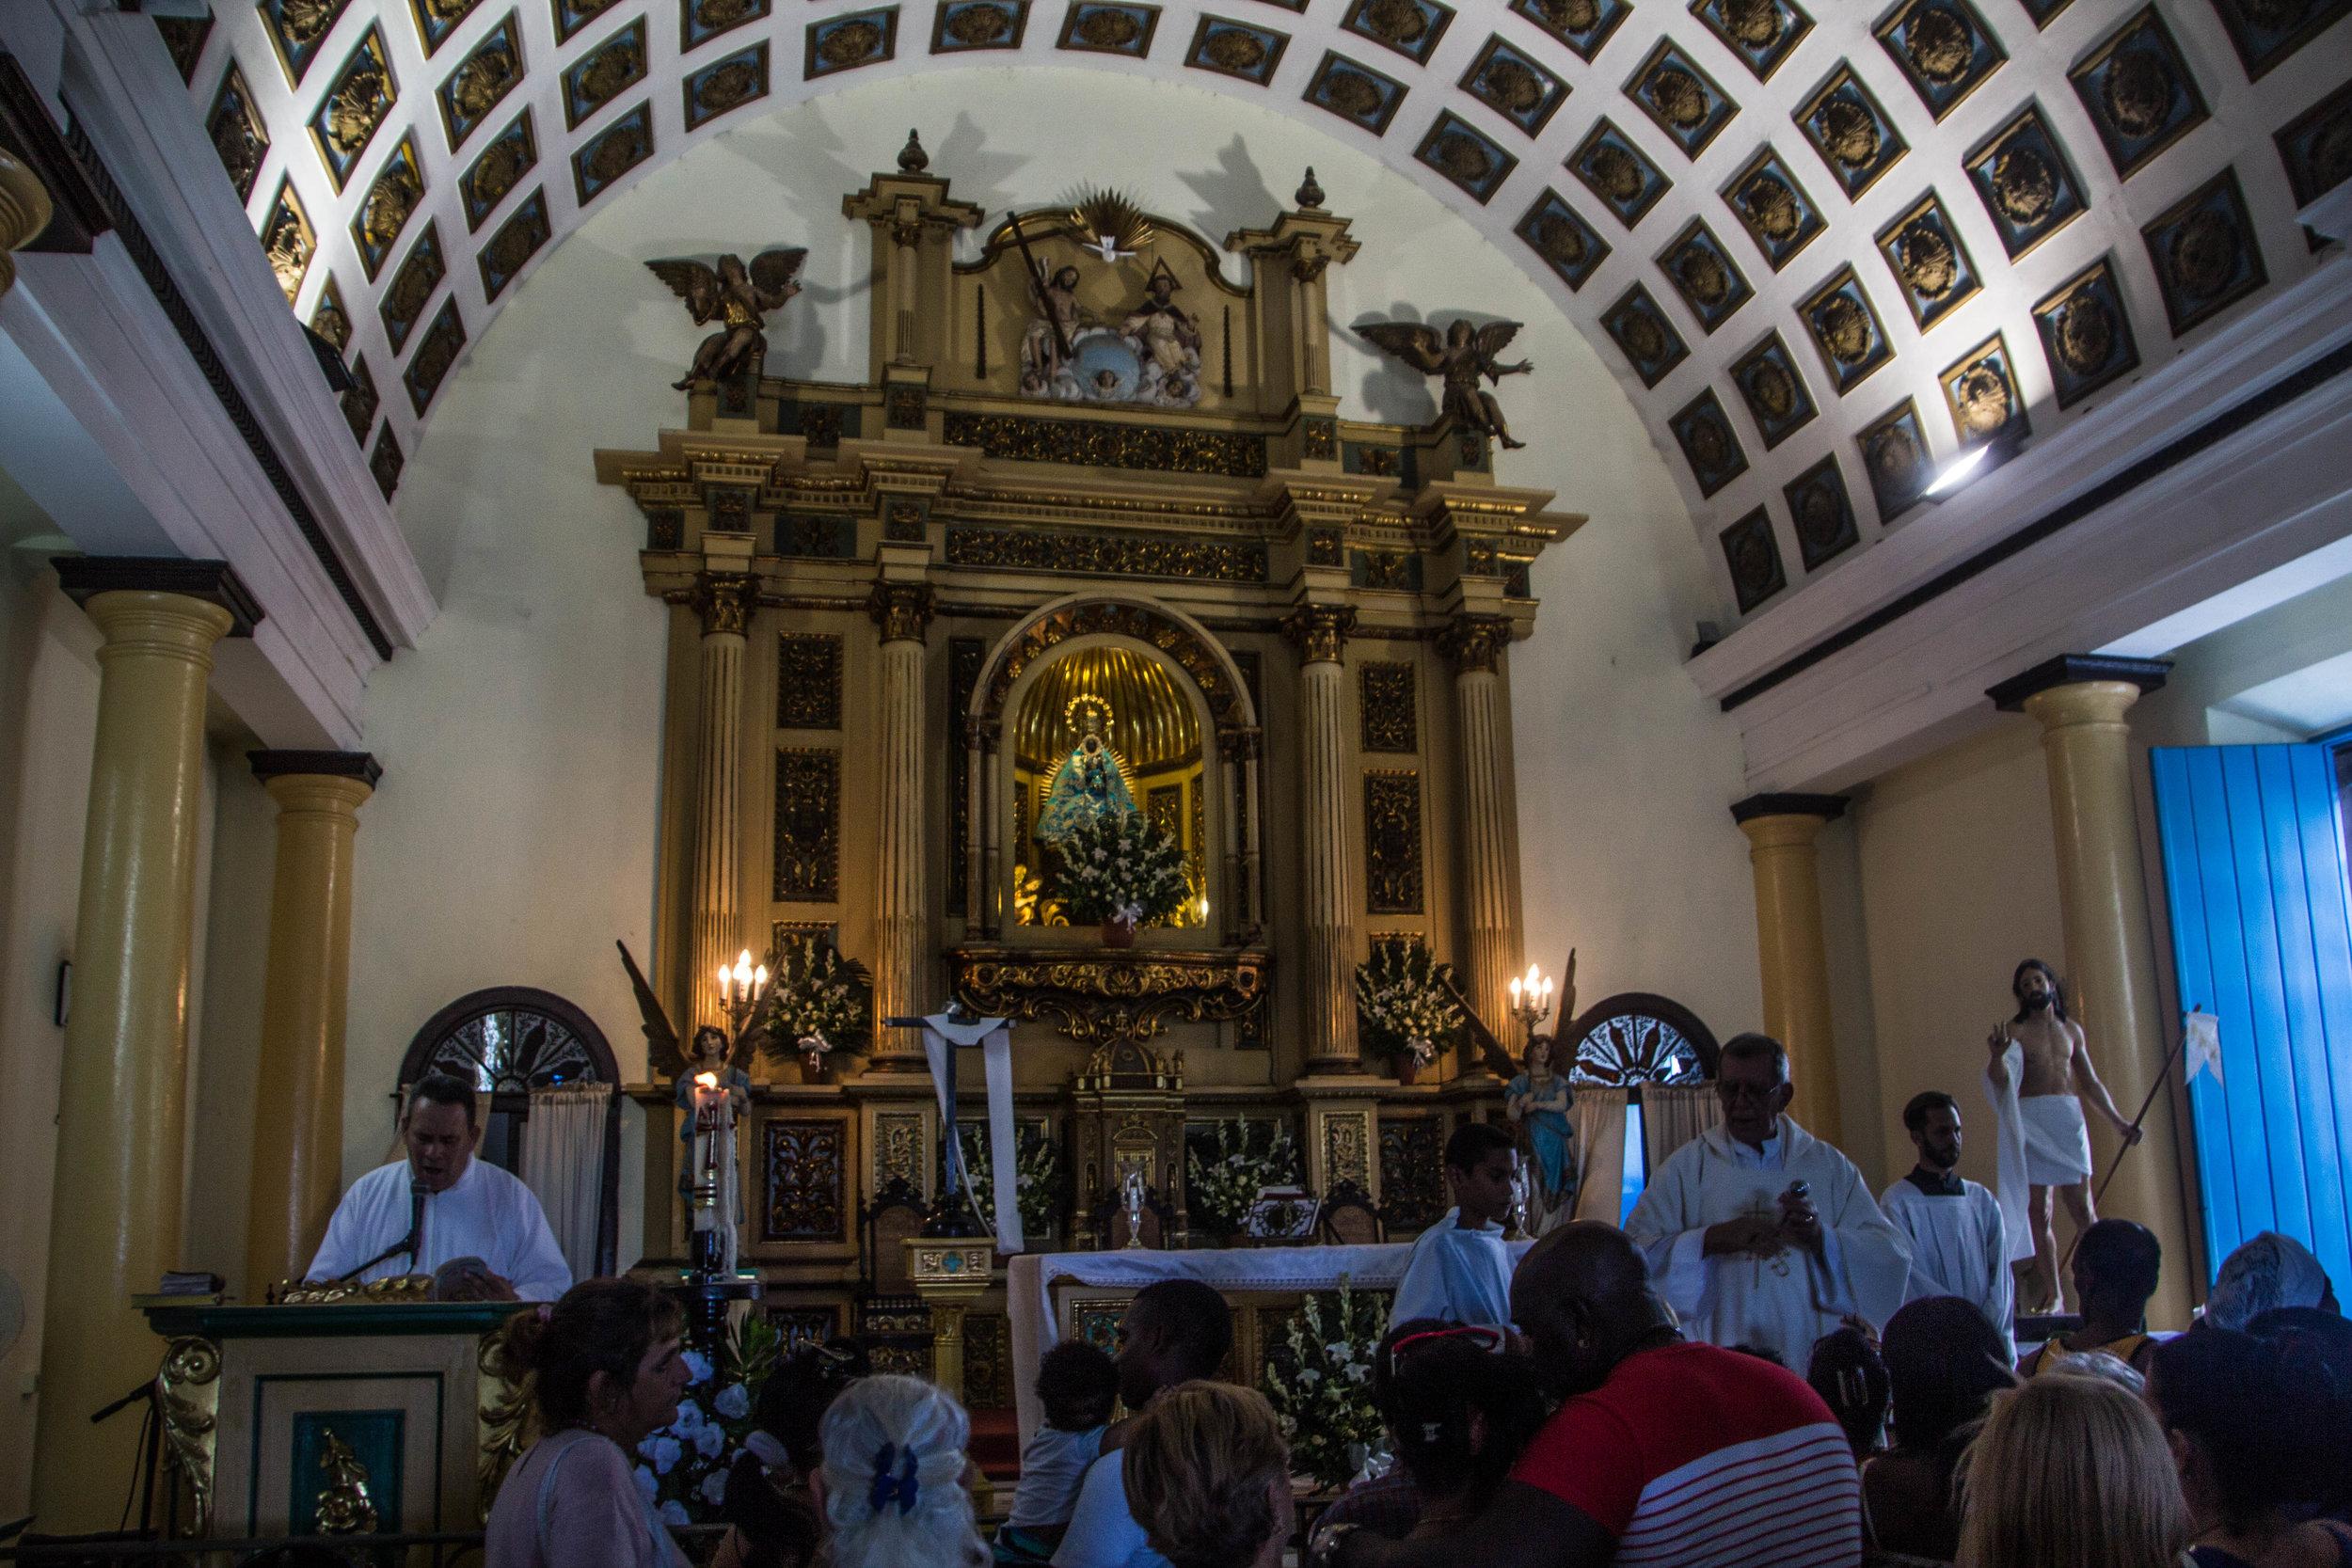 iglesia de nuestra señora de regla havana cuba santeria-1-6.jpg